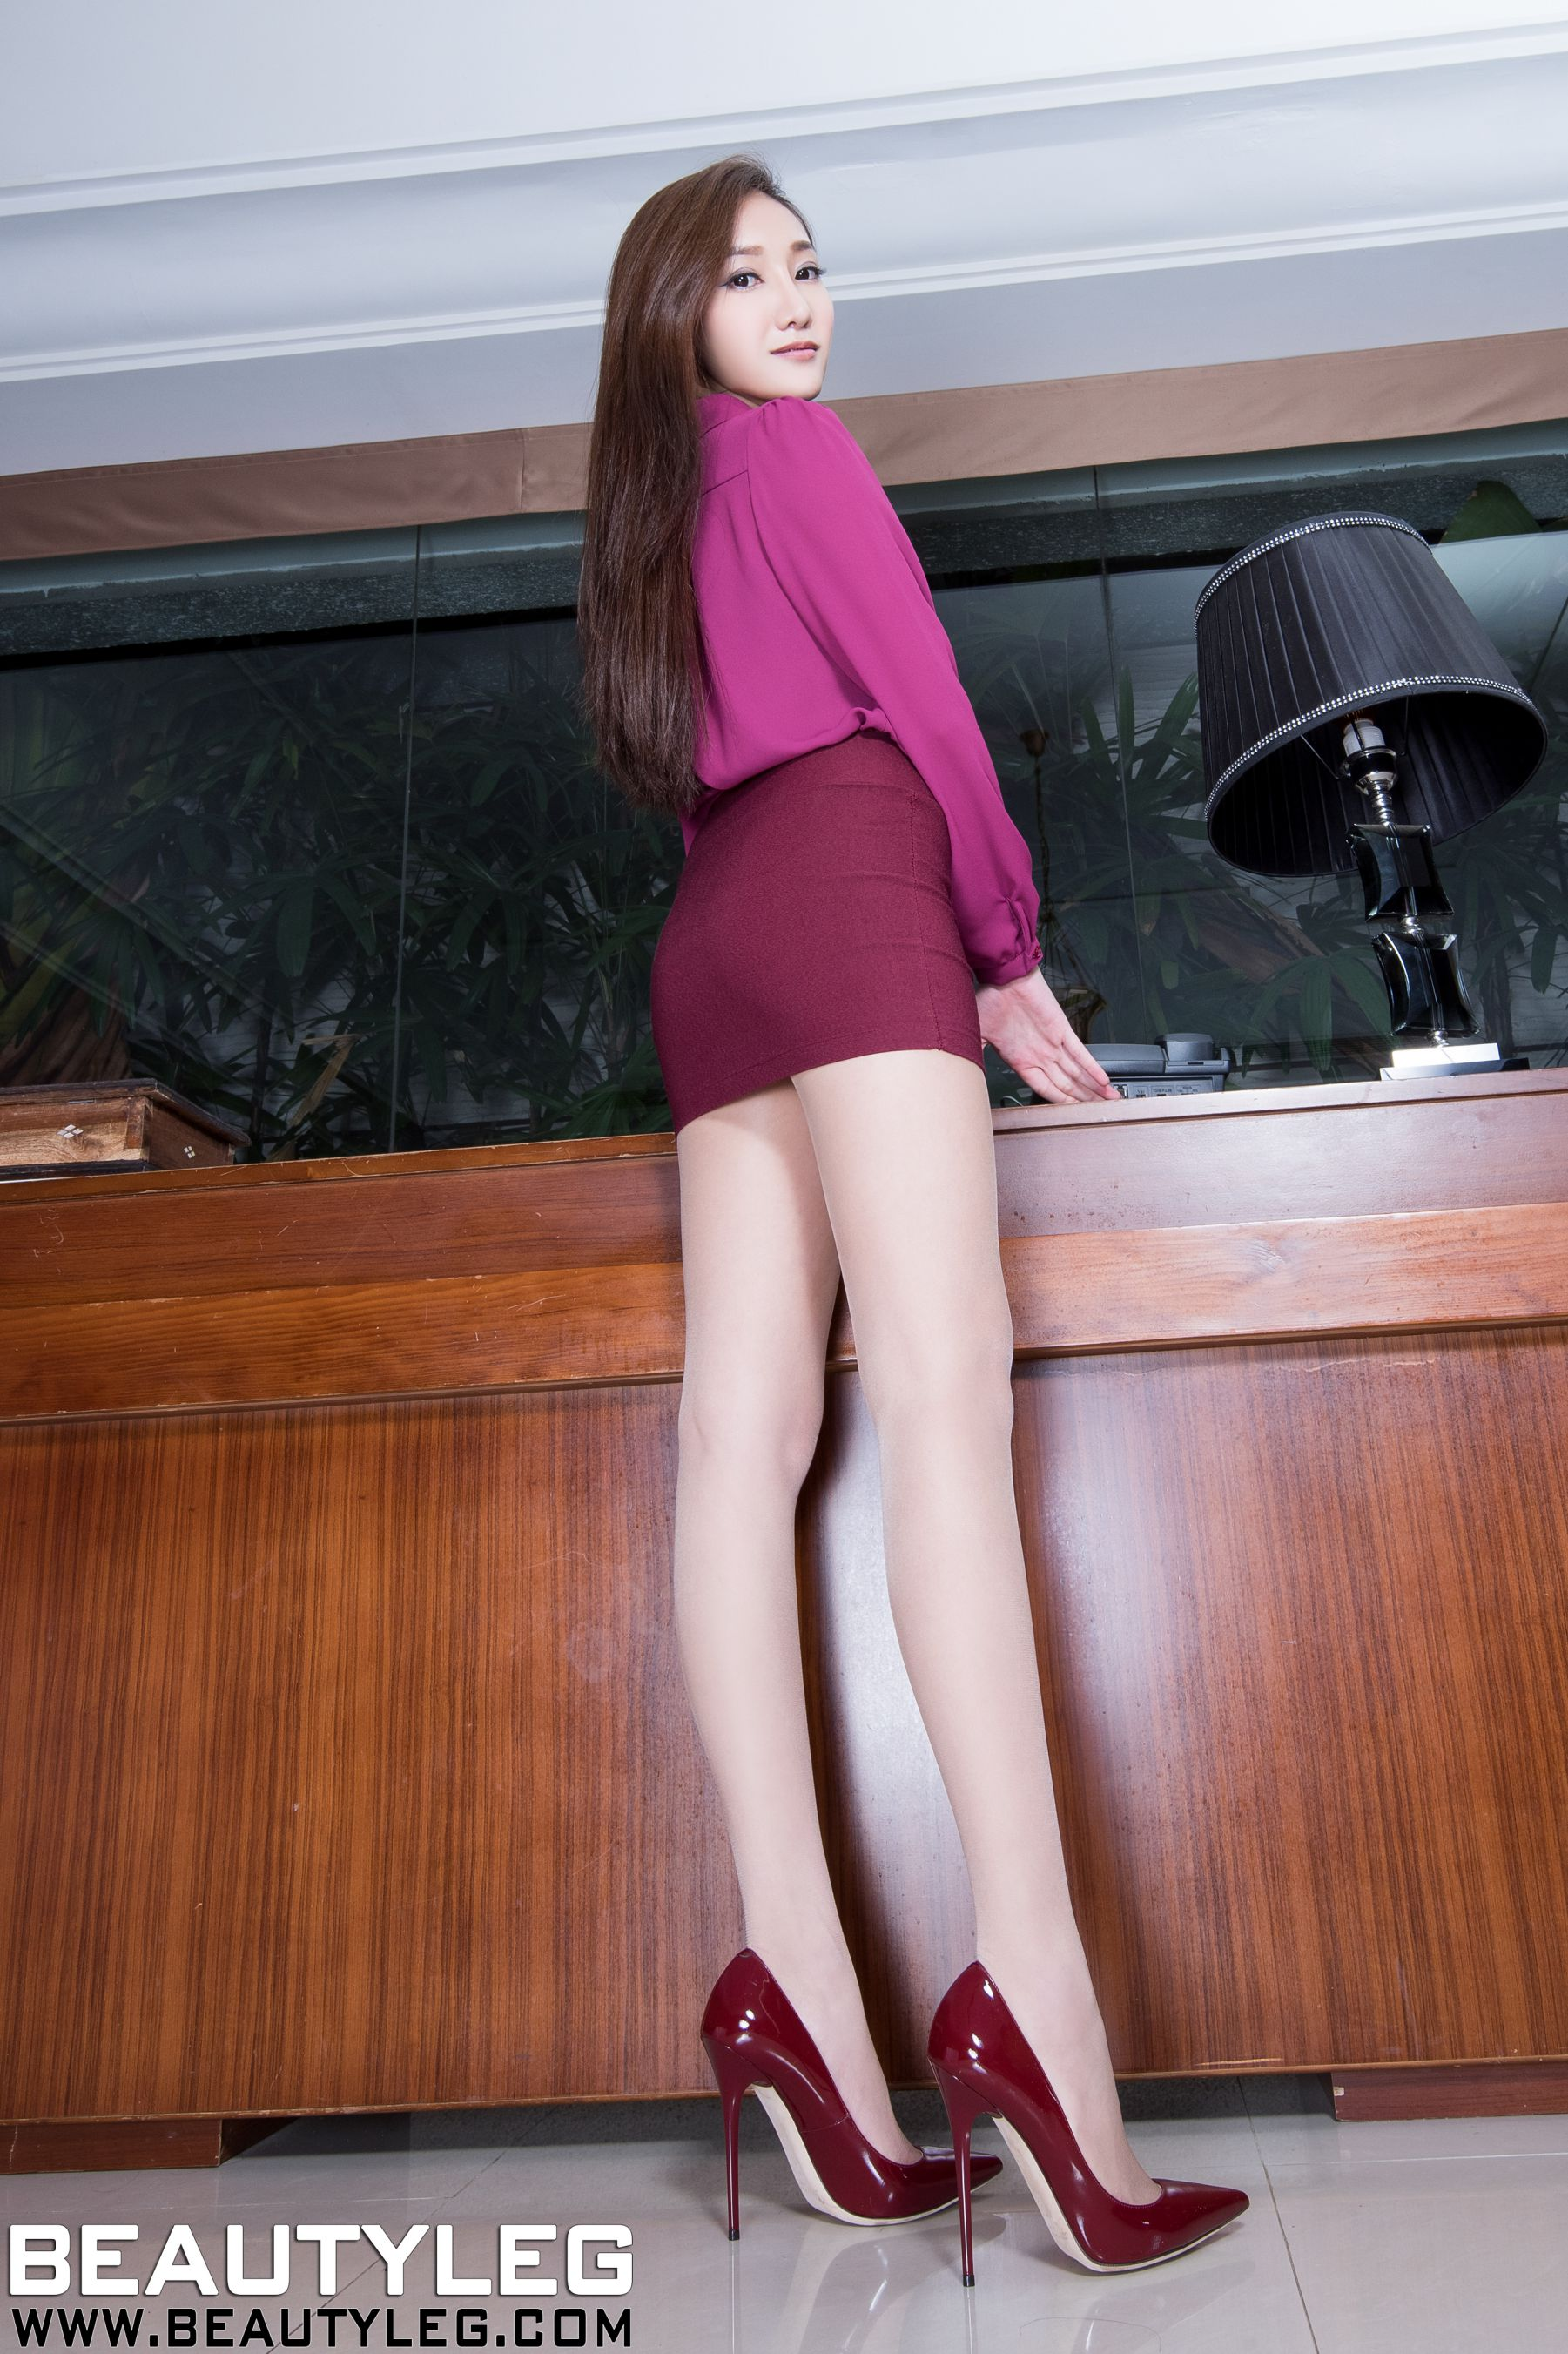 VOL.727 [Beautyleg]高跟美腿:陈思婷(腿模Tina,李霜)高品质写真套图(45P)